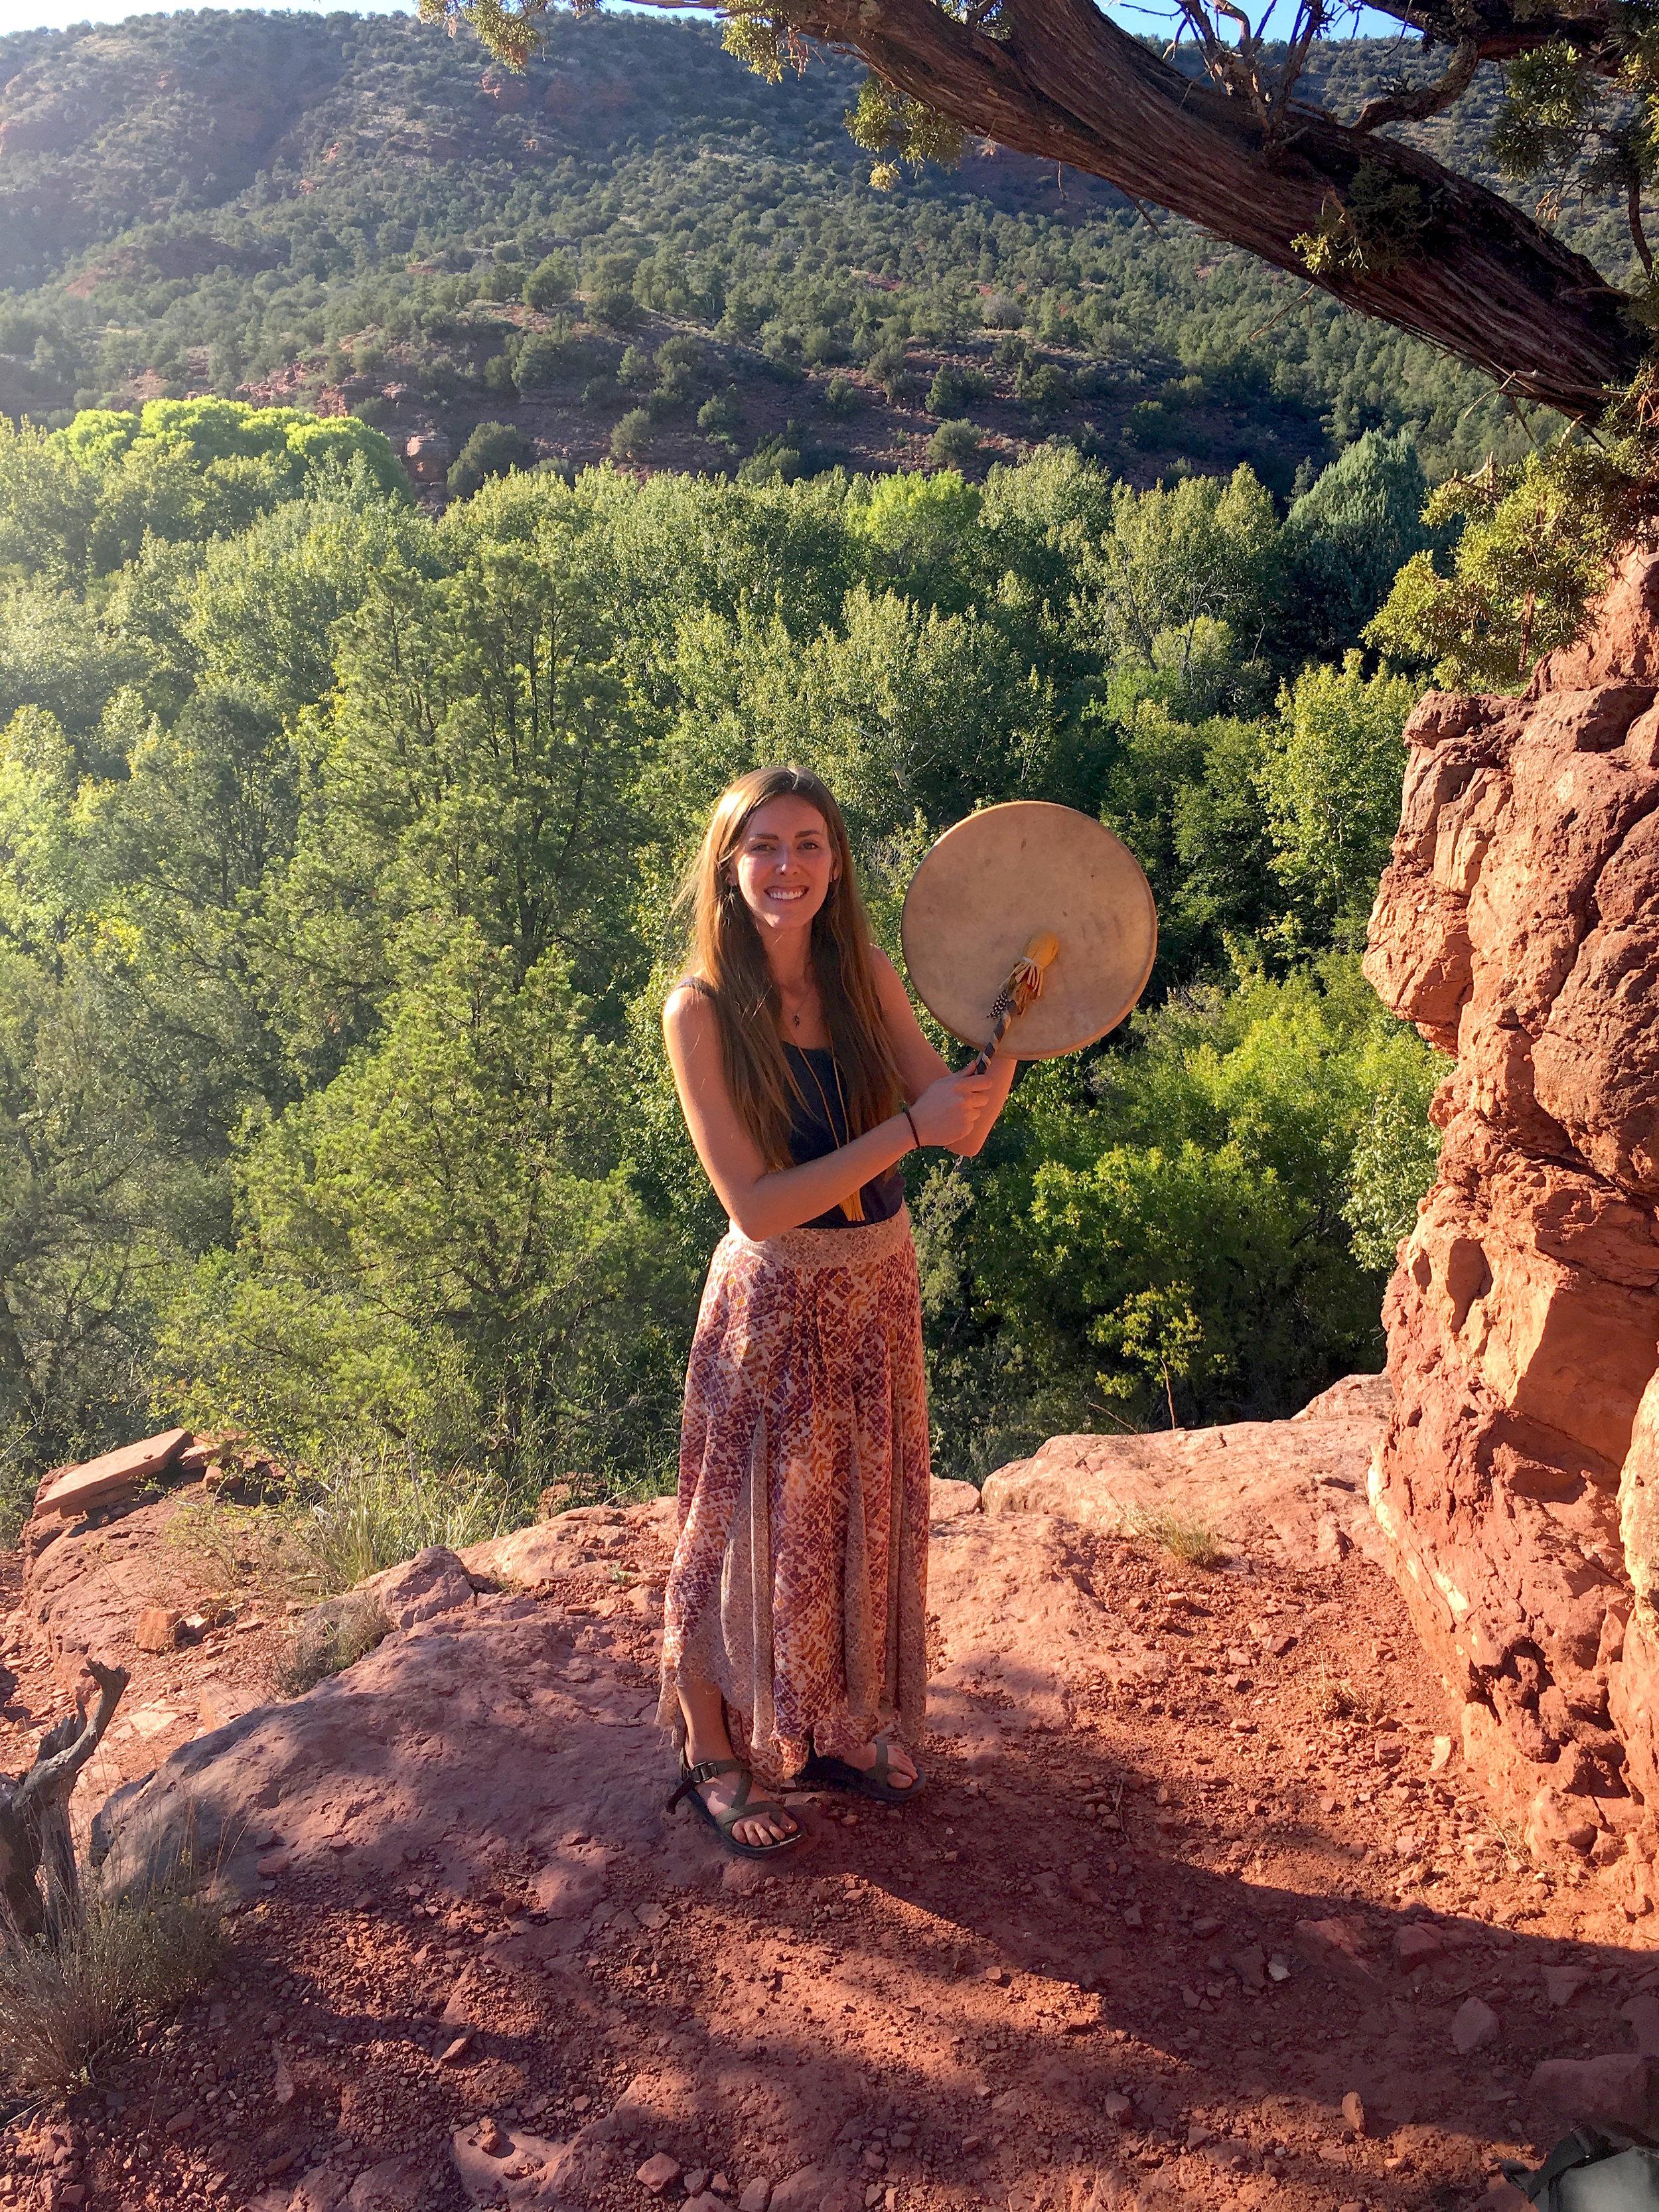 Alex with her drum, Sasewe, in Sedona, AZ.